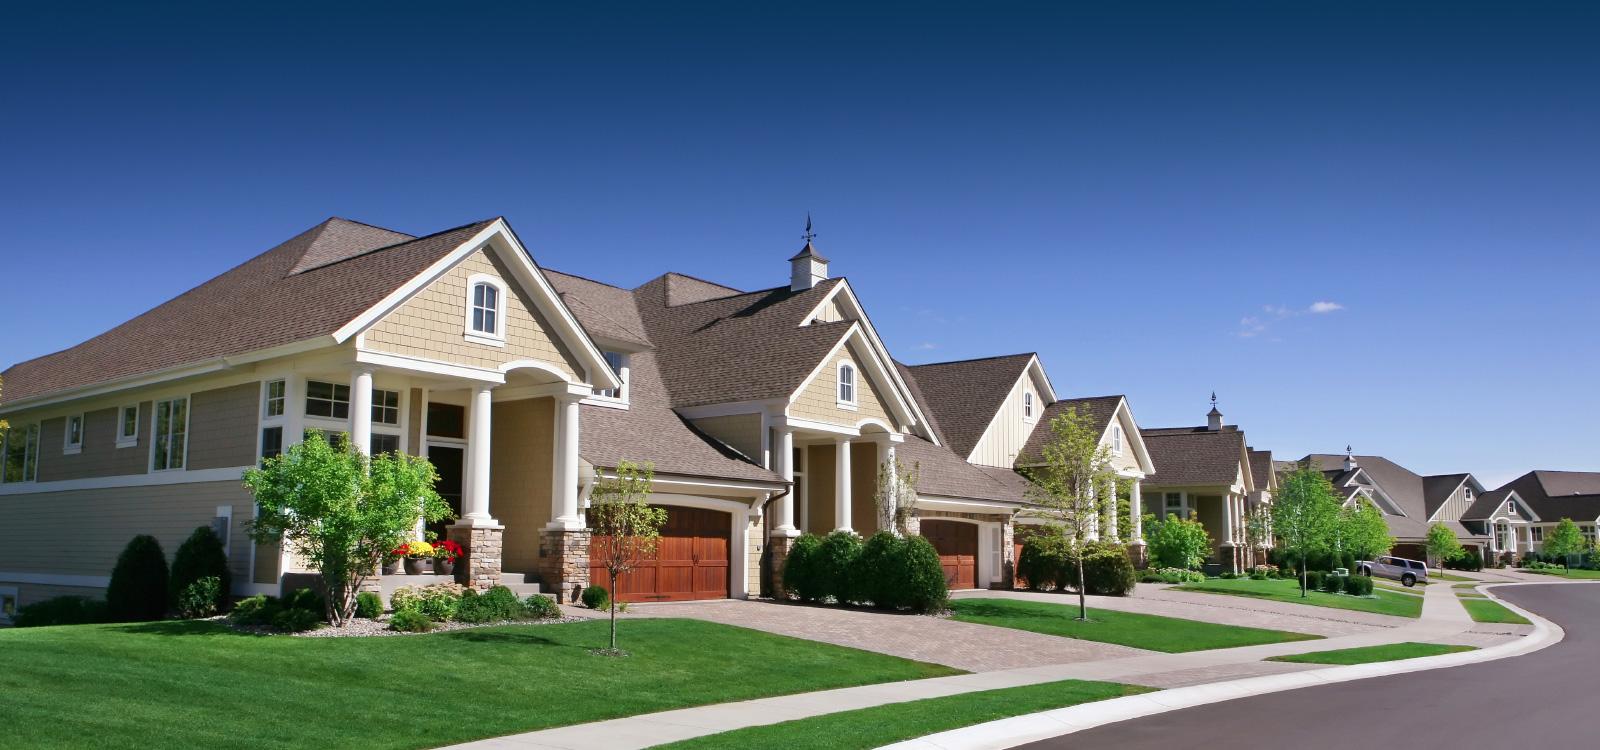 Home Inspection Checklist Colorado Springs